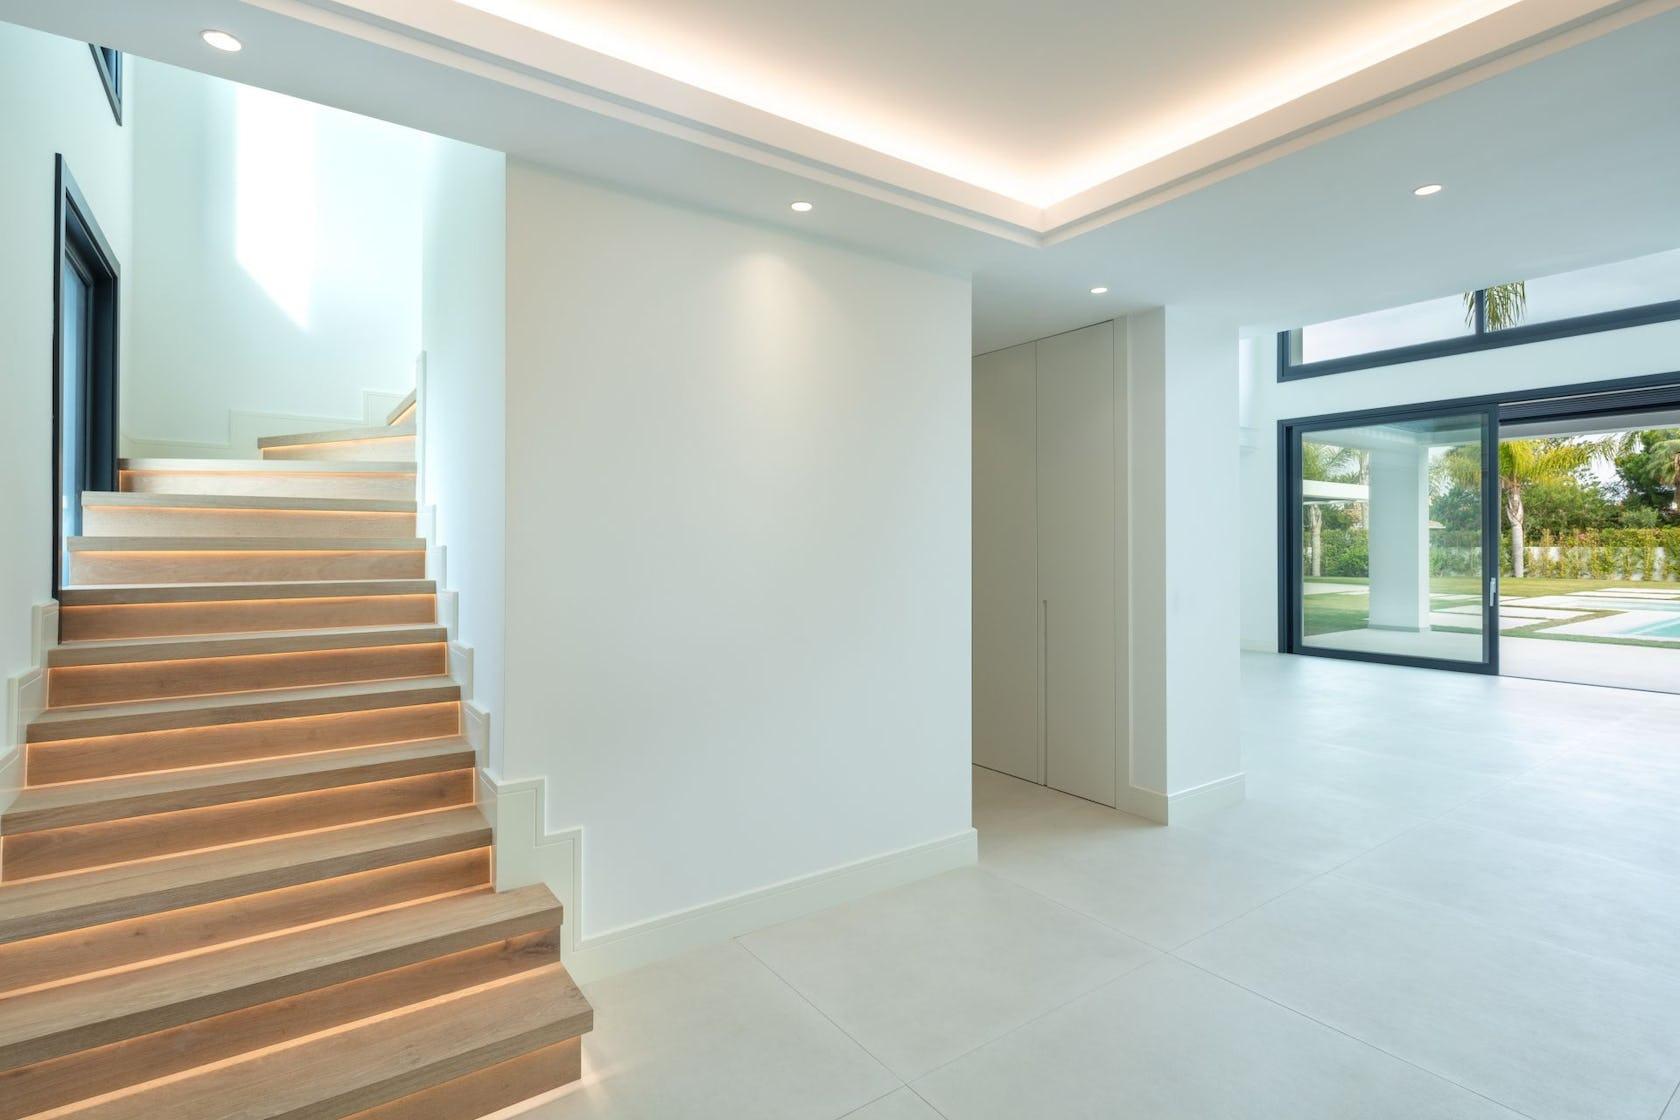 staircase flooring floor interior design indoors room